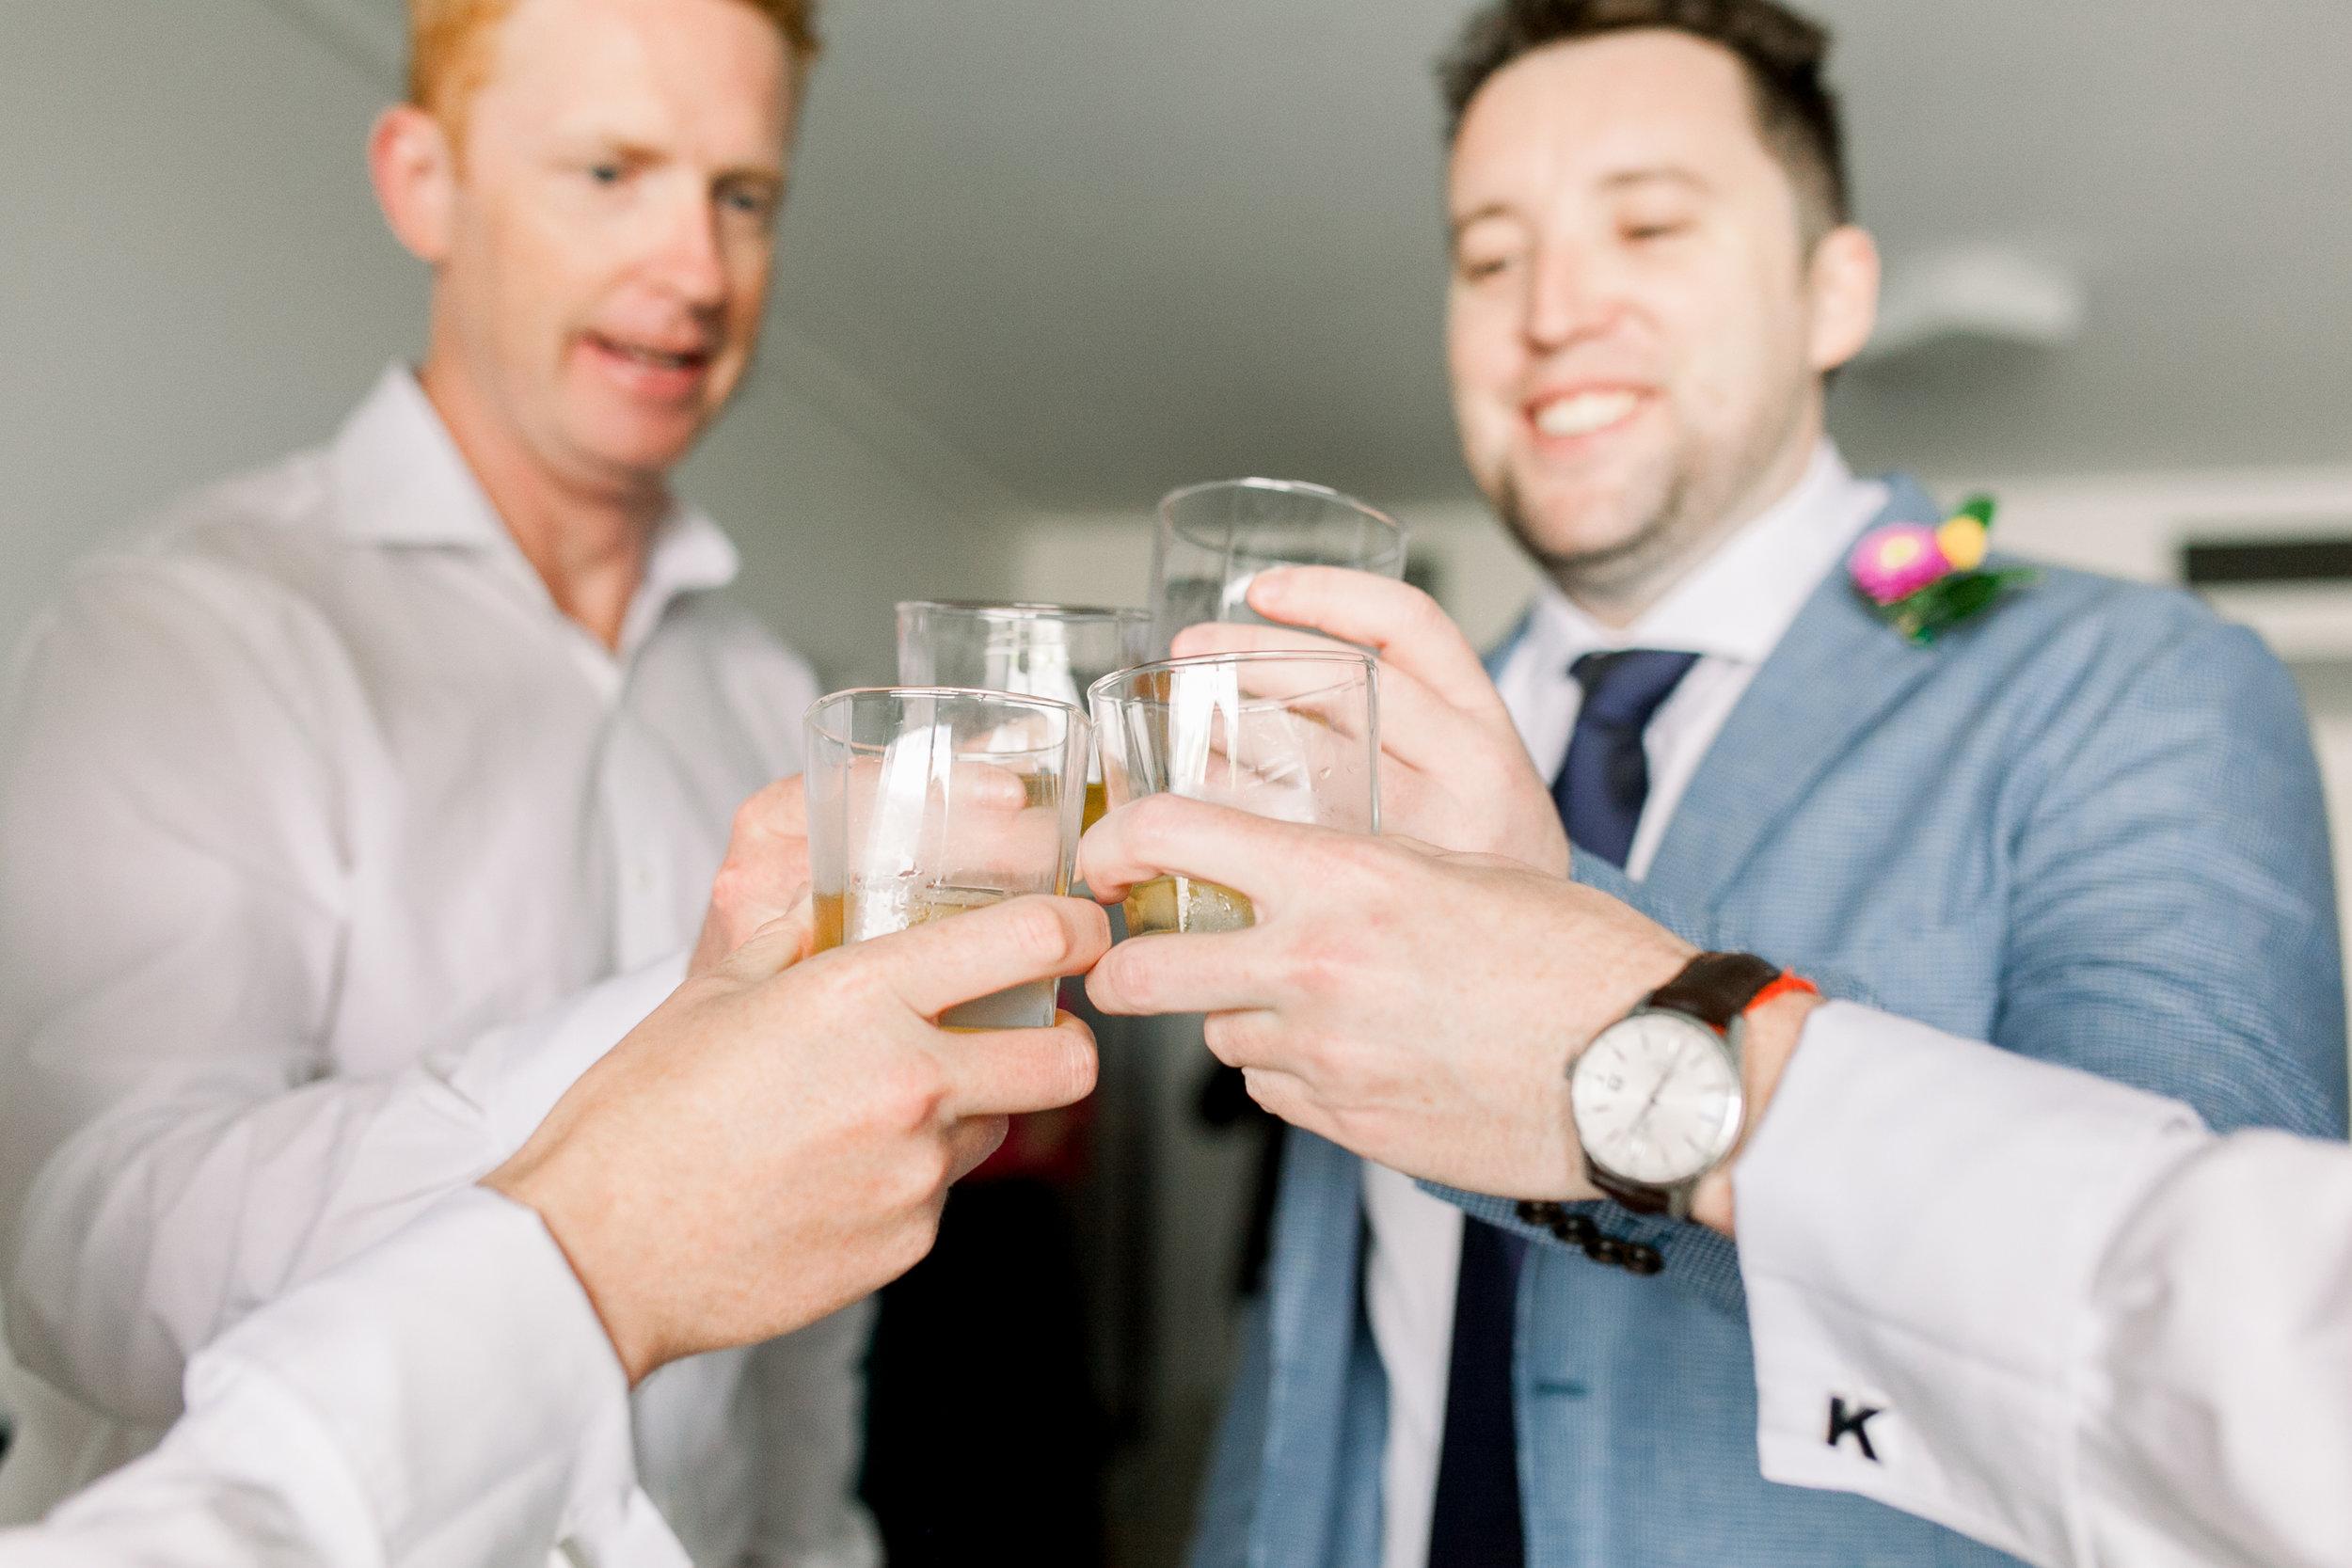 refinery-wedding-brisbane-city-wedding-photographer-10.jpg